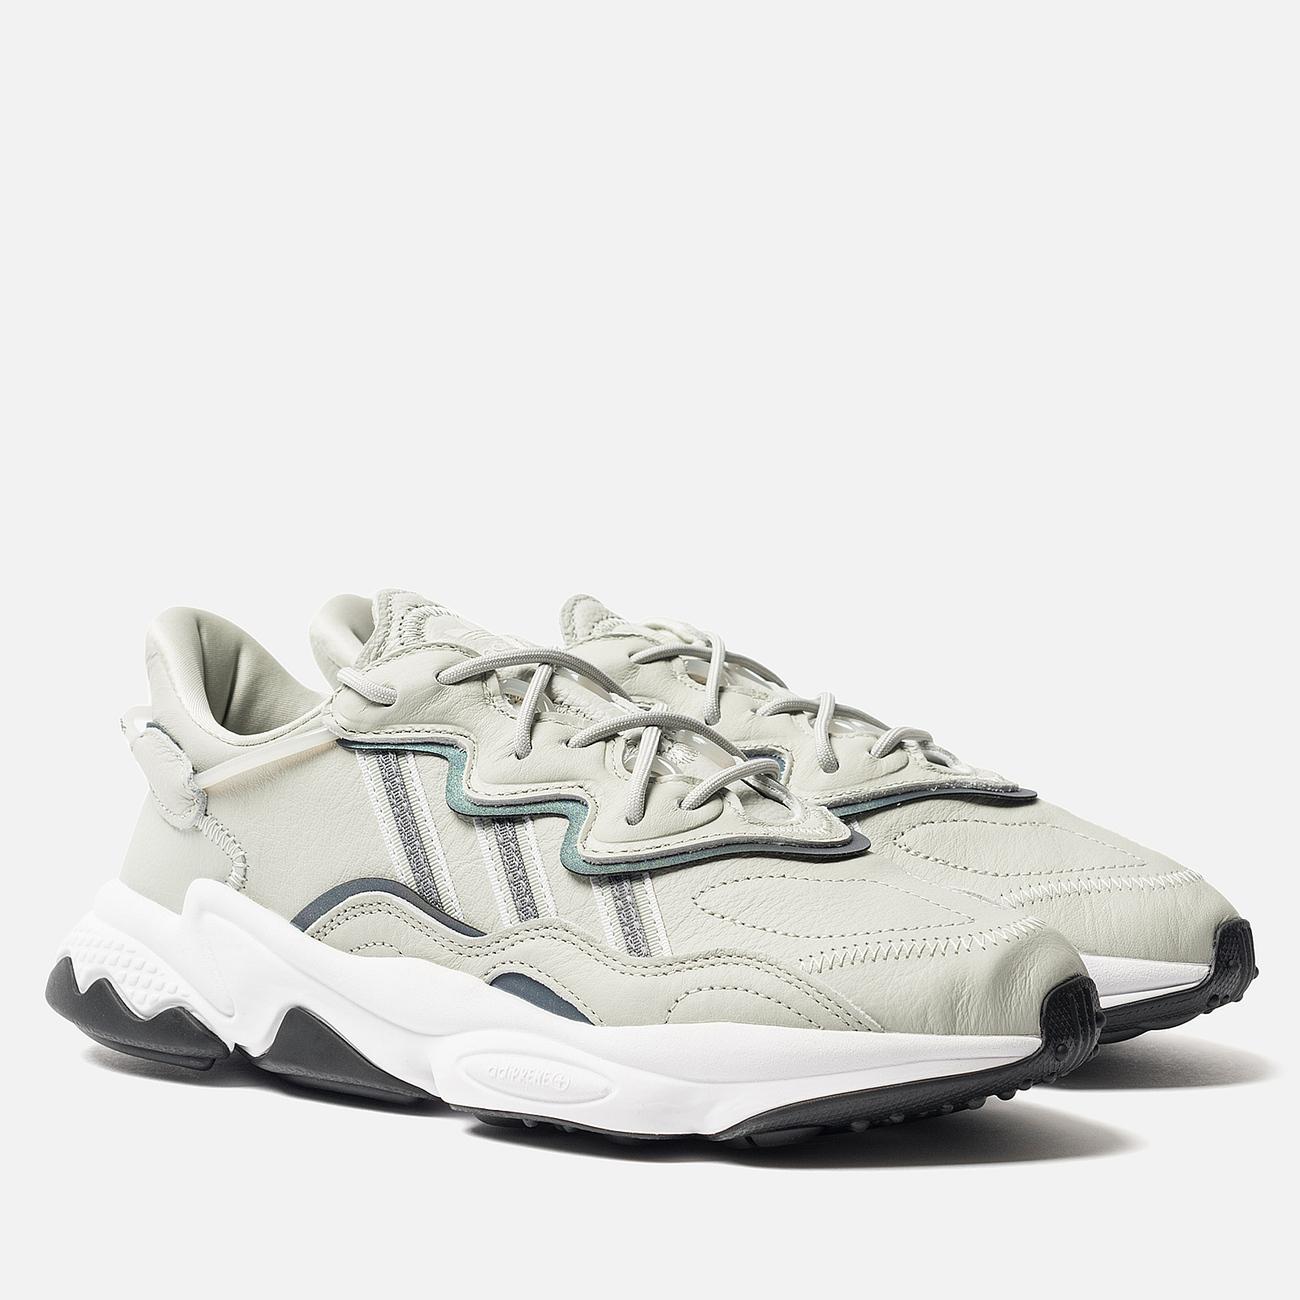 Мужские кроссовки adidas Originals Ozweego Ash Silver/Grey Three/Trace Cargo